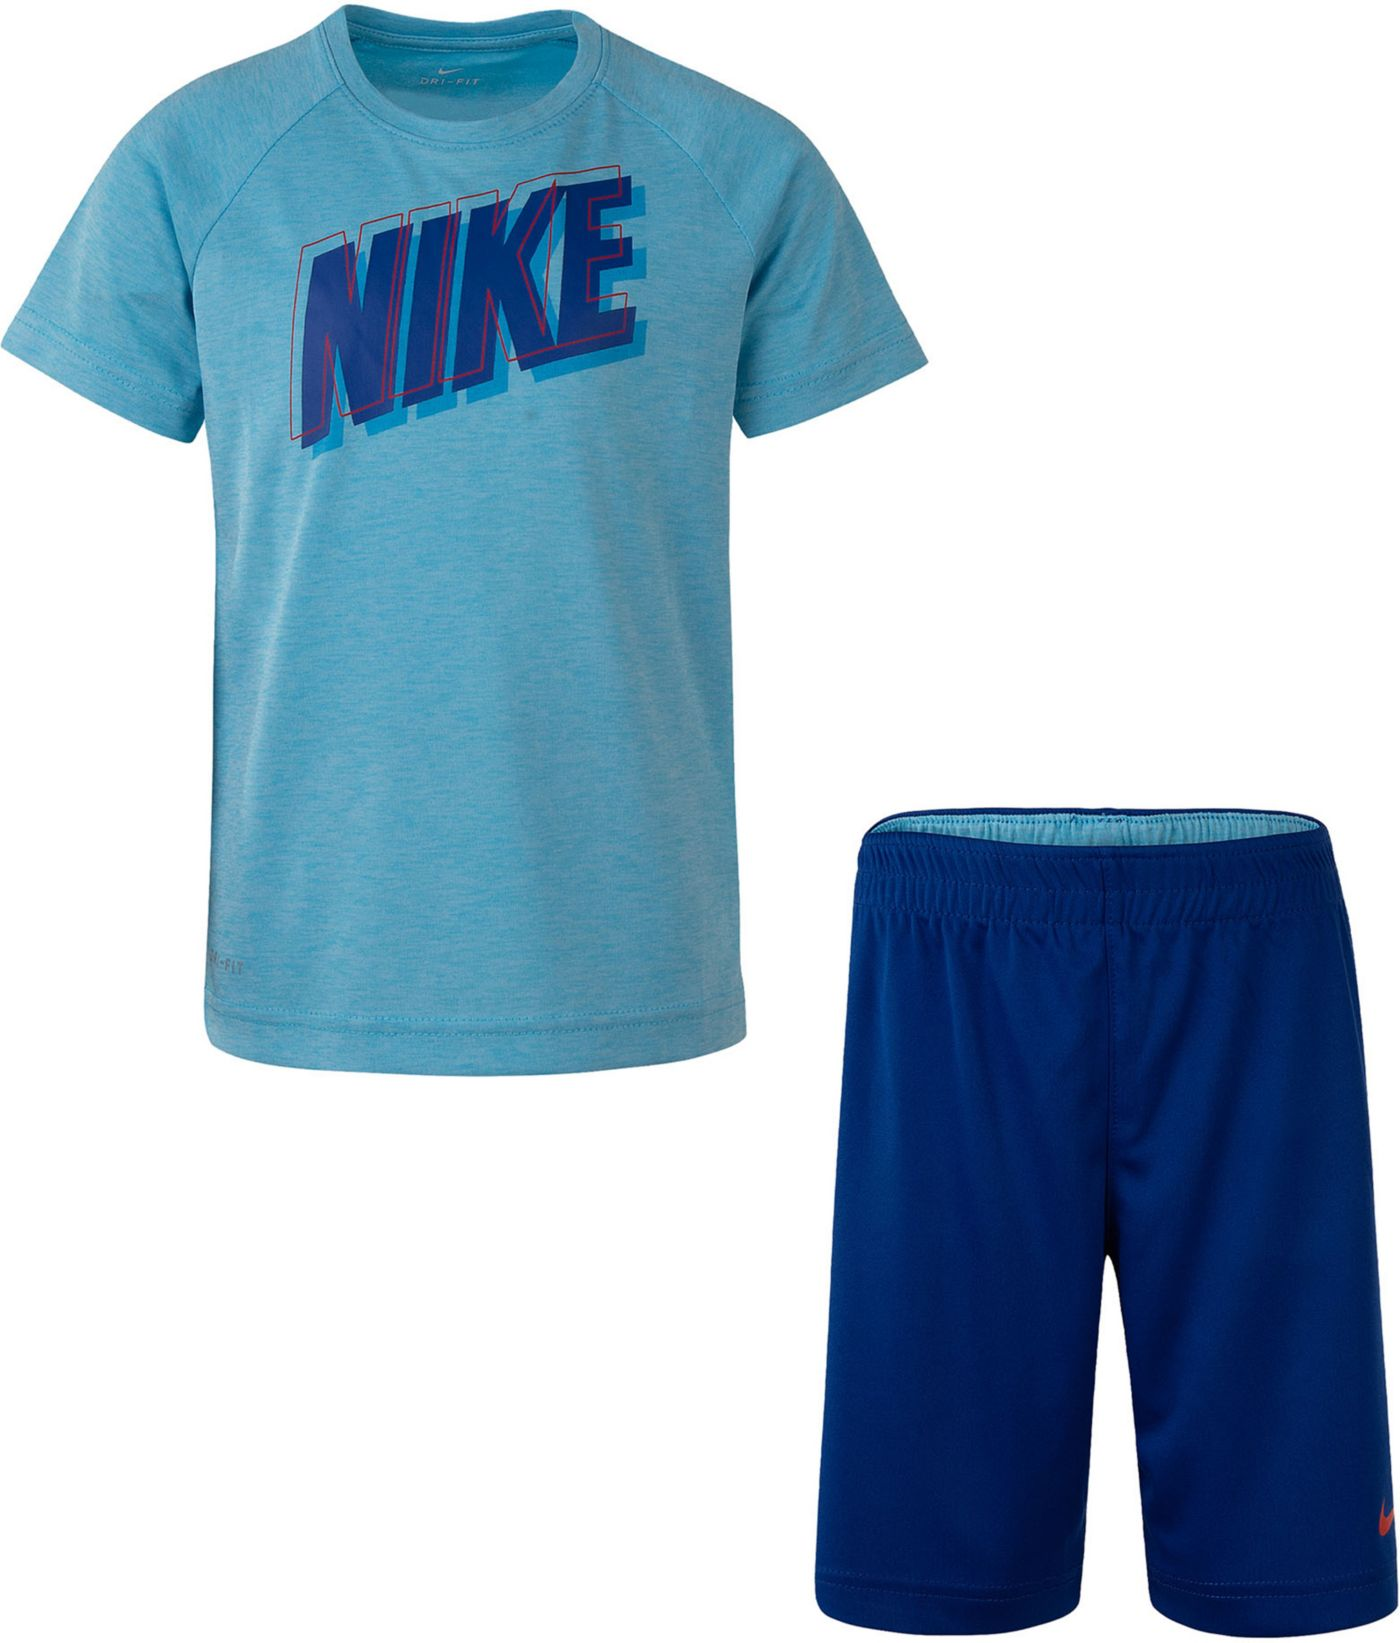 Nike Little Boys' Dri-FIT Raglan T-Shirt and Shorts Set